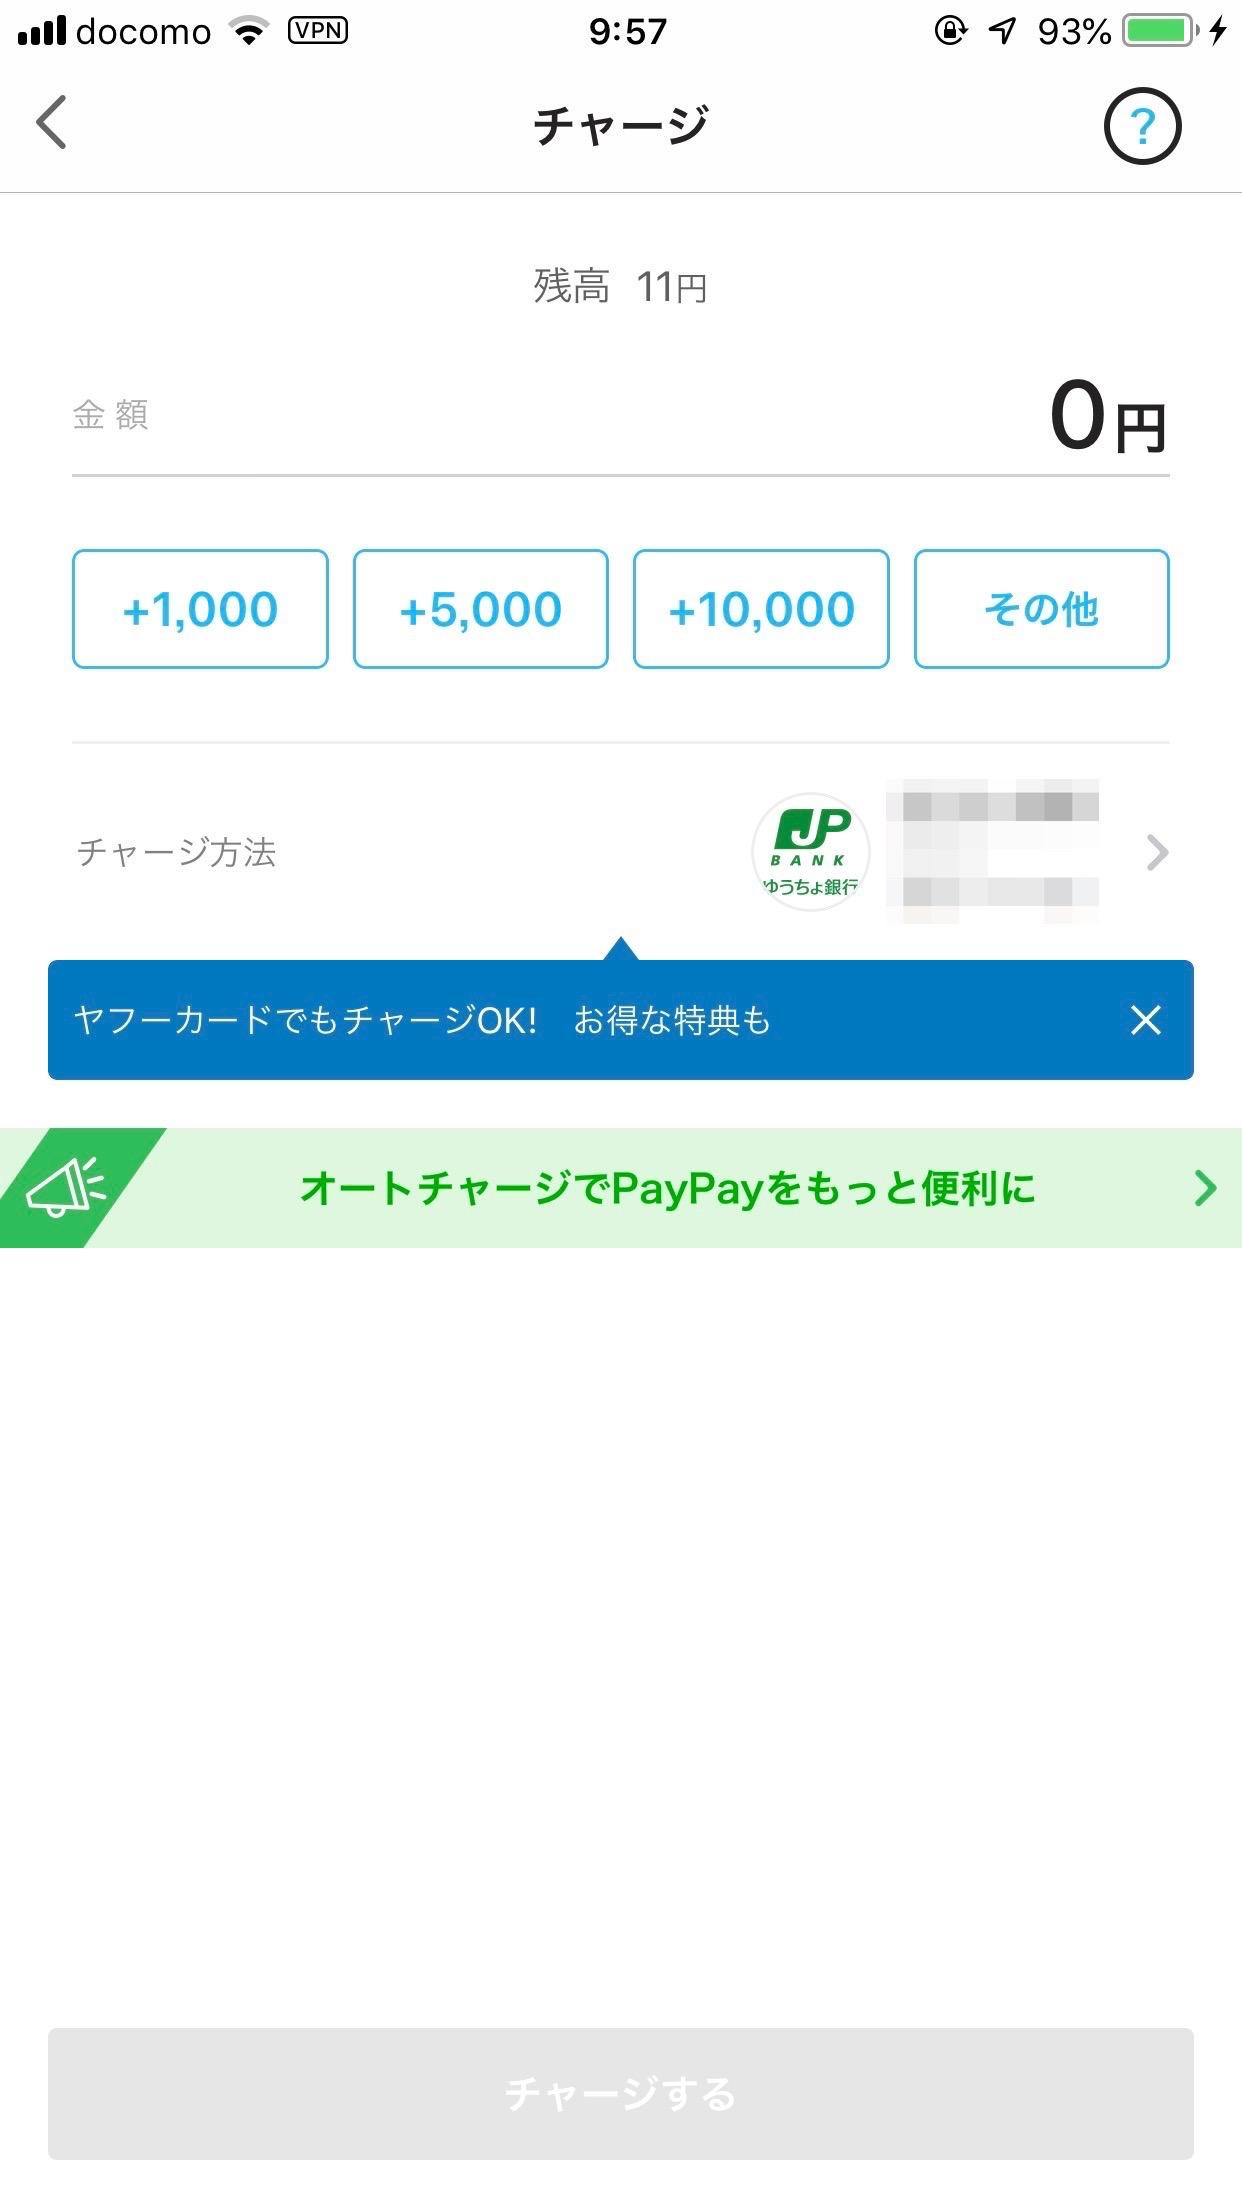 【PayPay】オートチャージに対応 〜銀行口座・ヤフーカードからチャージ可能